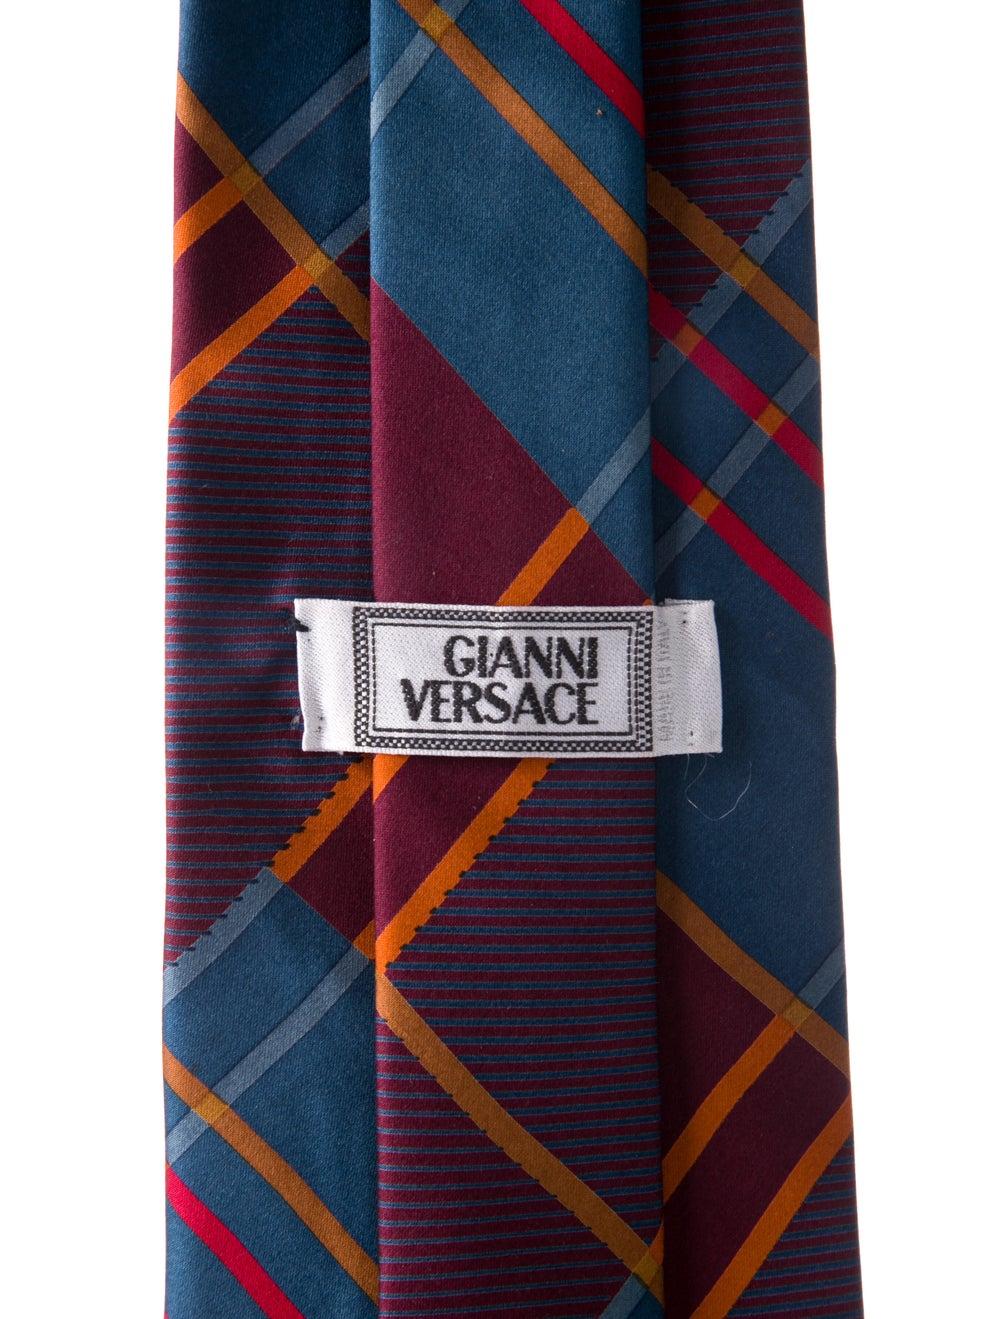 Gianni Versace Silk Plaid Tie multicolor - image 2